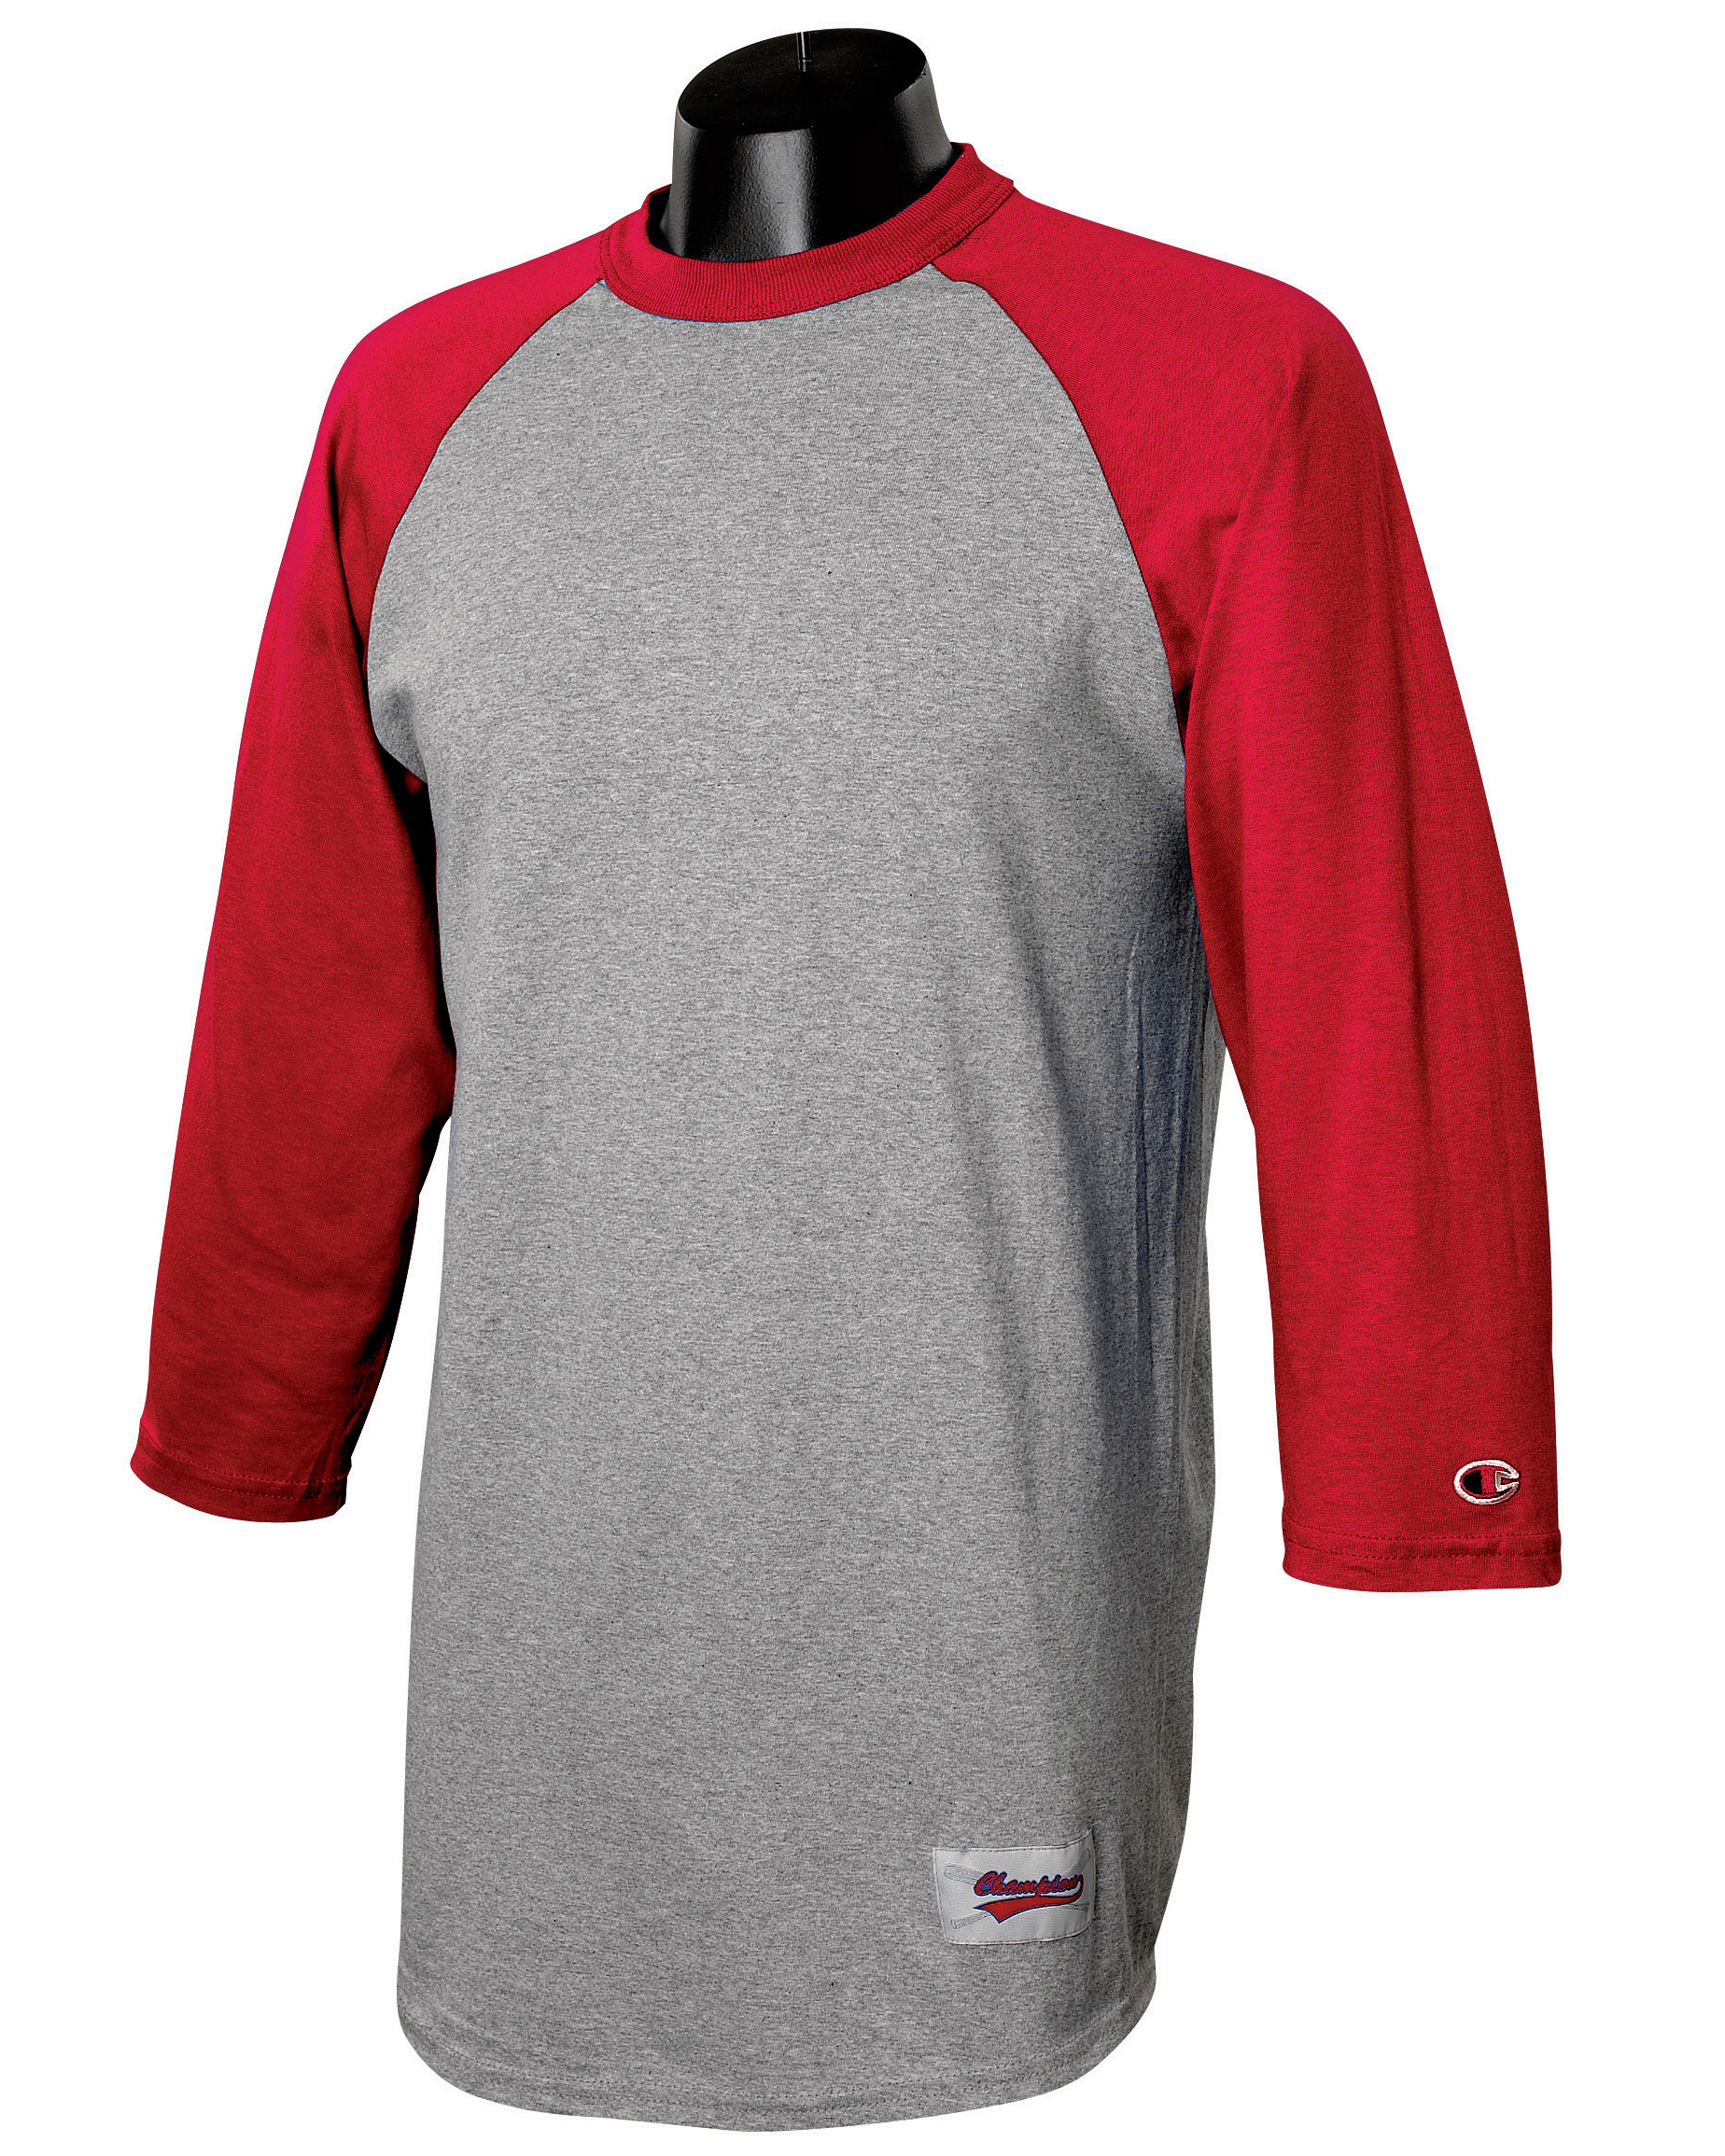 7ccf418f Adult 5.2 Oz. Raglan T-Shirt. Combination In Stock. $13.64. Champion. T1397